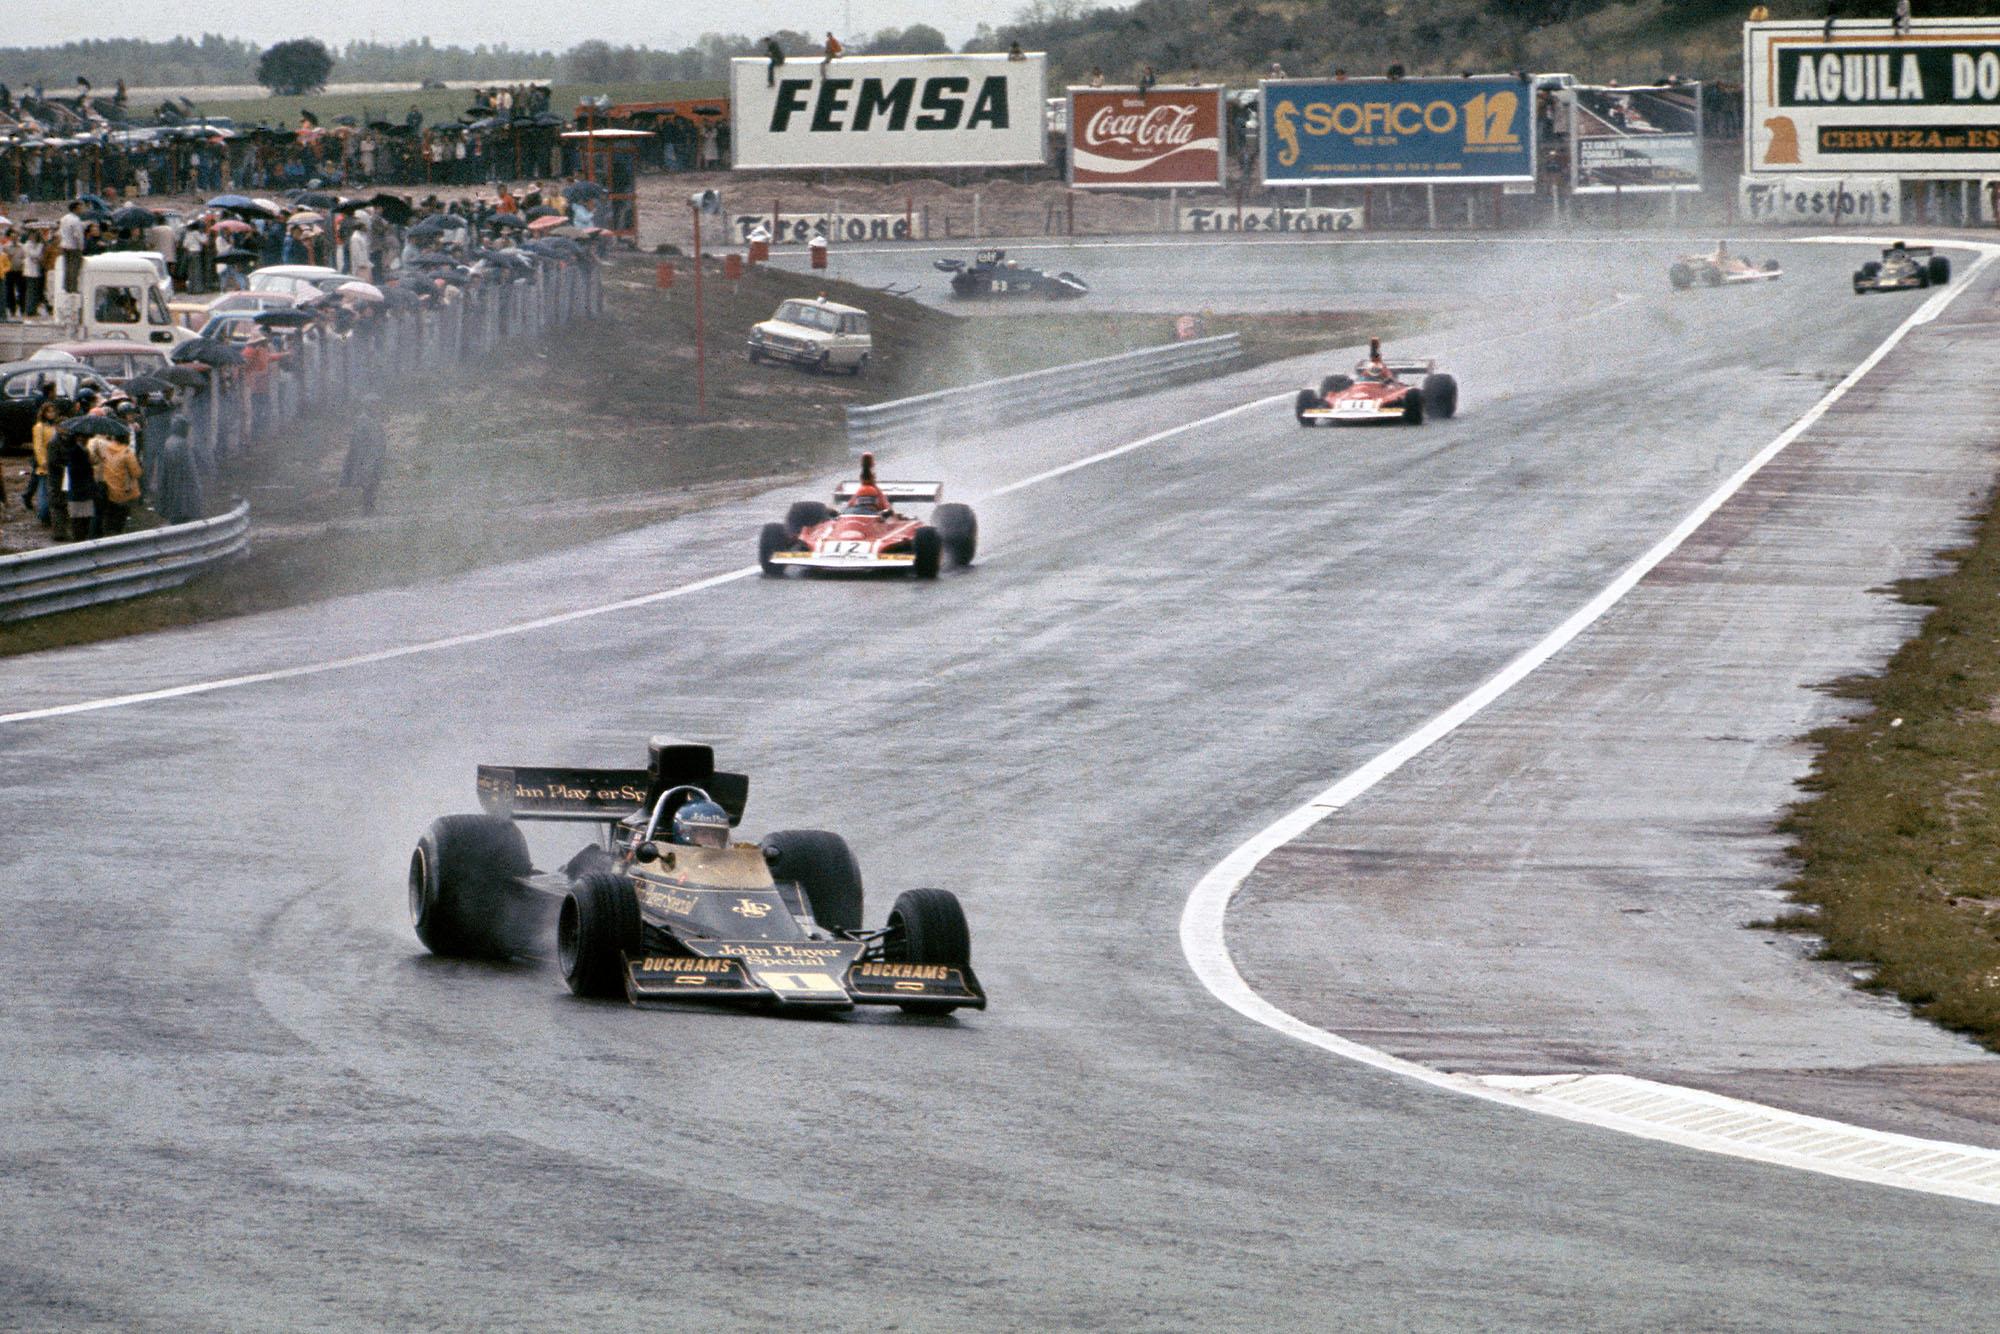 Ronnie Peterson leads Niki Lauda